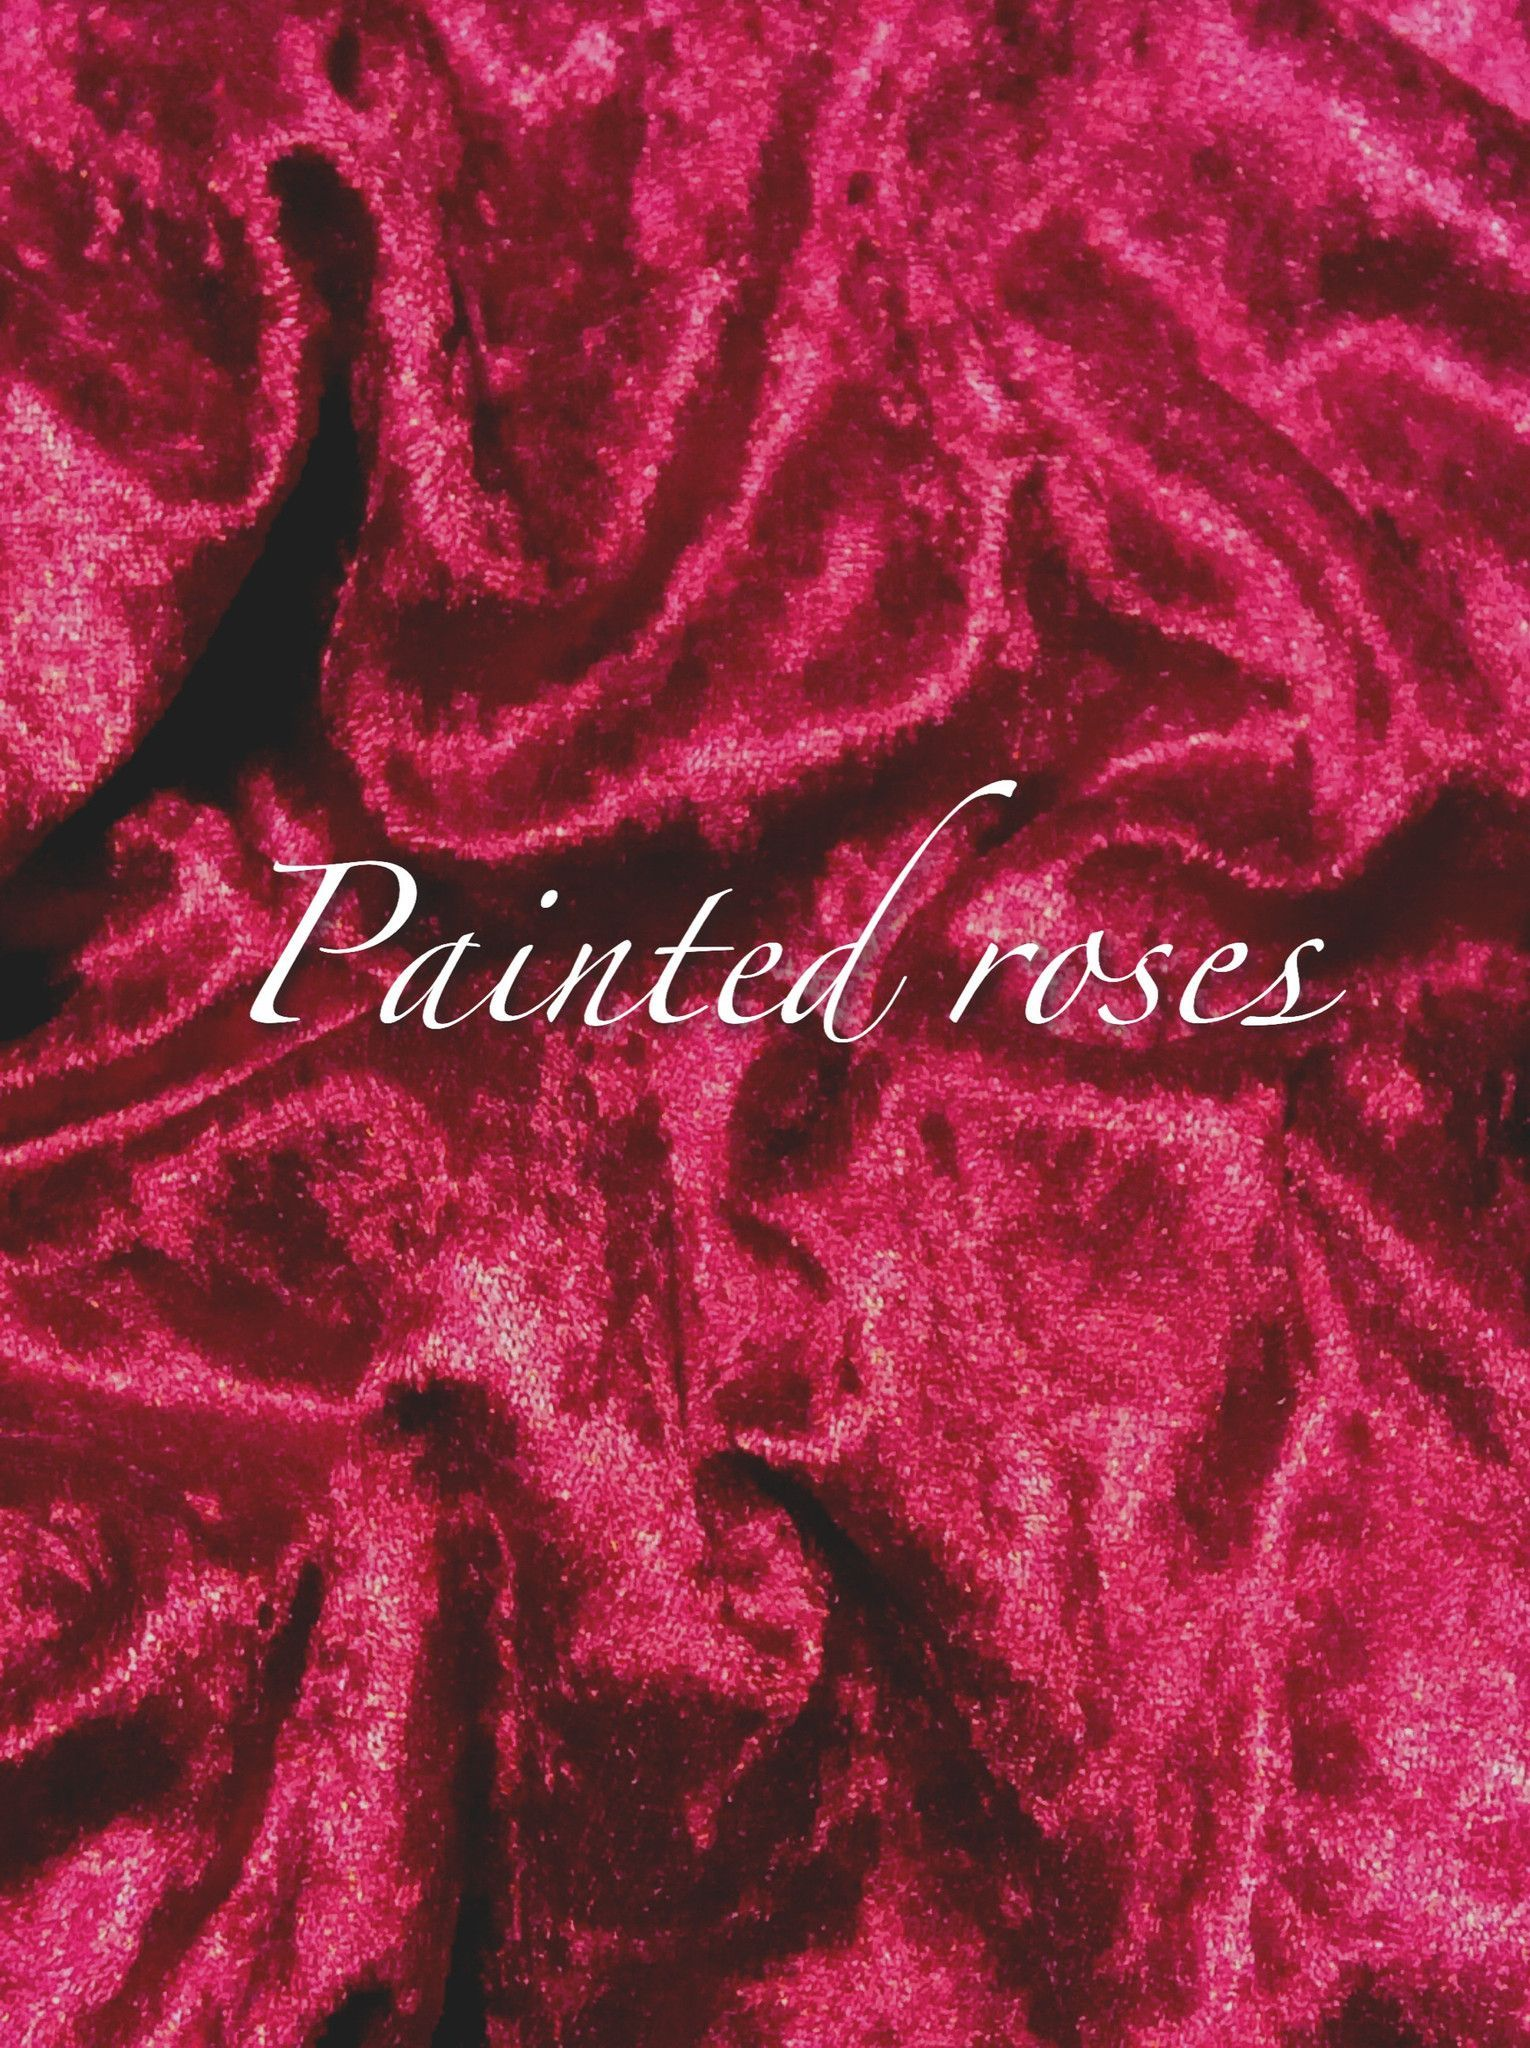 Luxury Crushed Velvet - Painted Roses